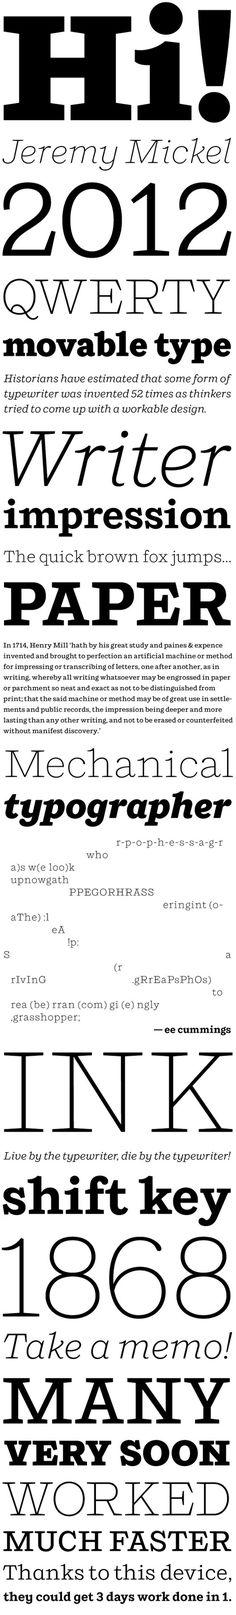 Shift by Jeremy Mickel #typography #type #font #slab #serif #mckl